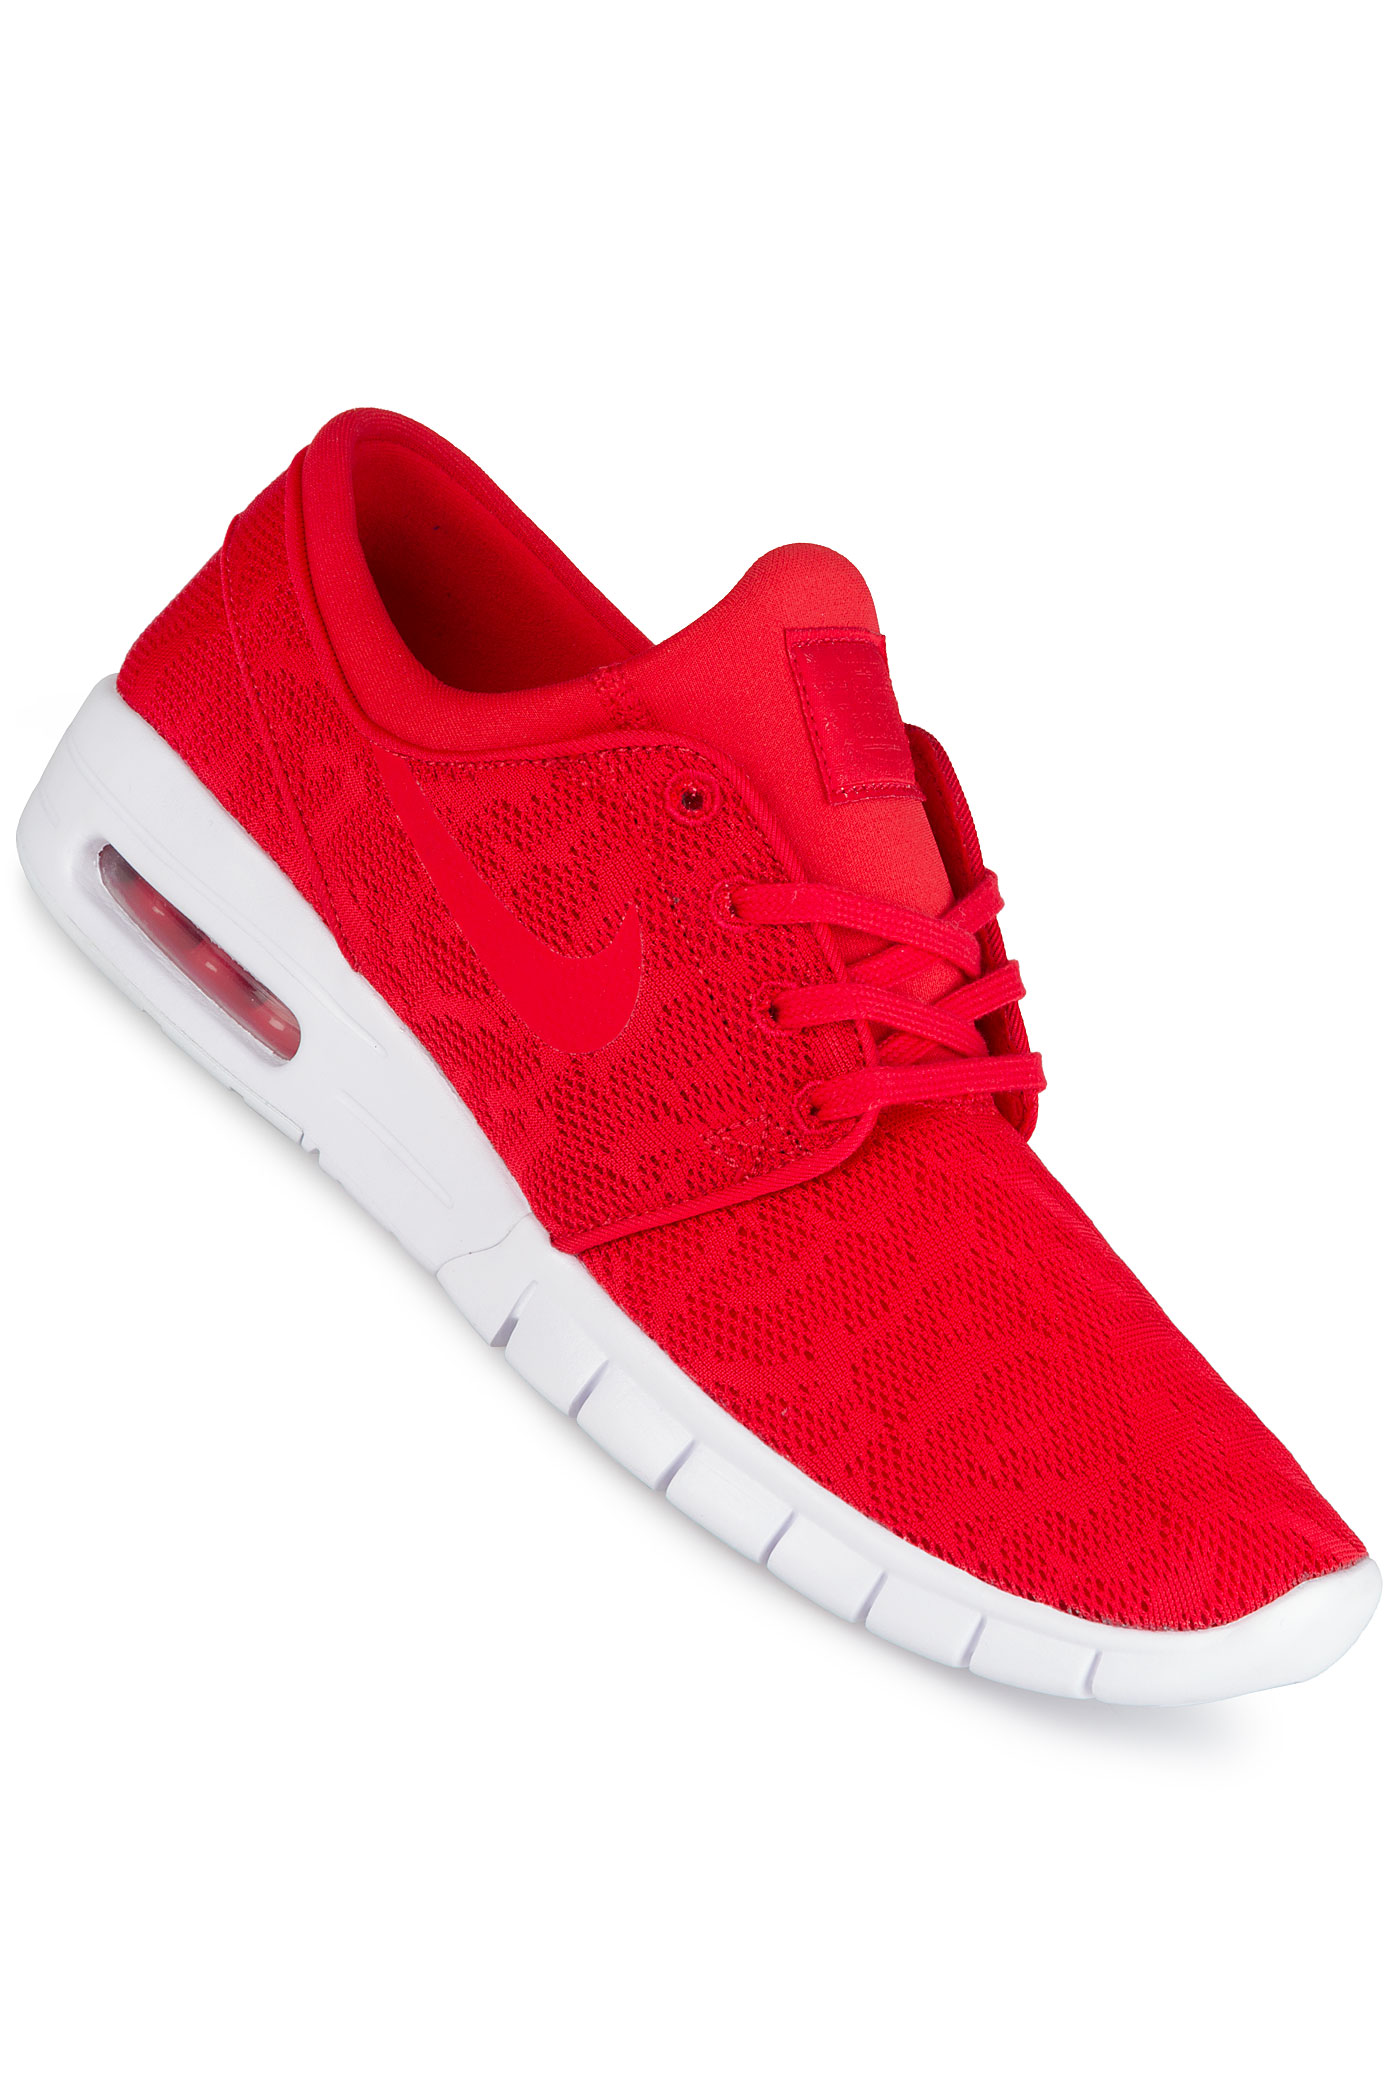 nike sb stefan janoski max chaussure university red white achetez sur skatedeluxe. Black Bedroom Furniture Sets. Home Design Ideas